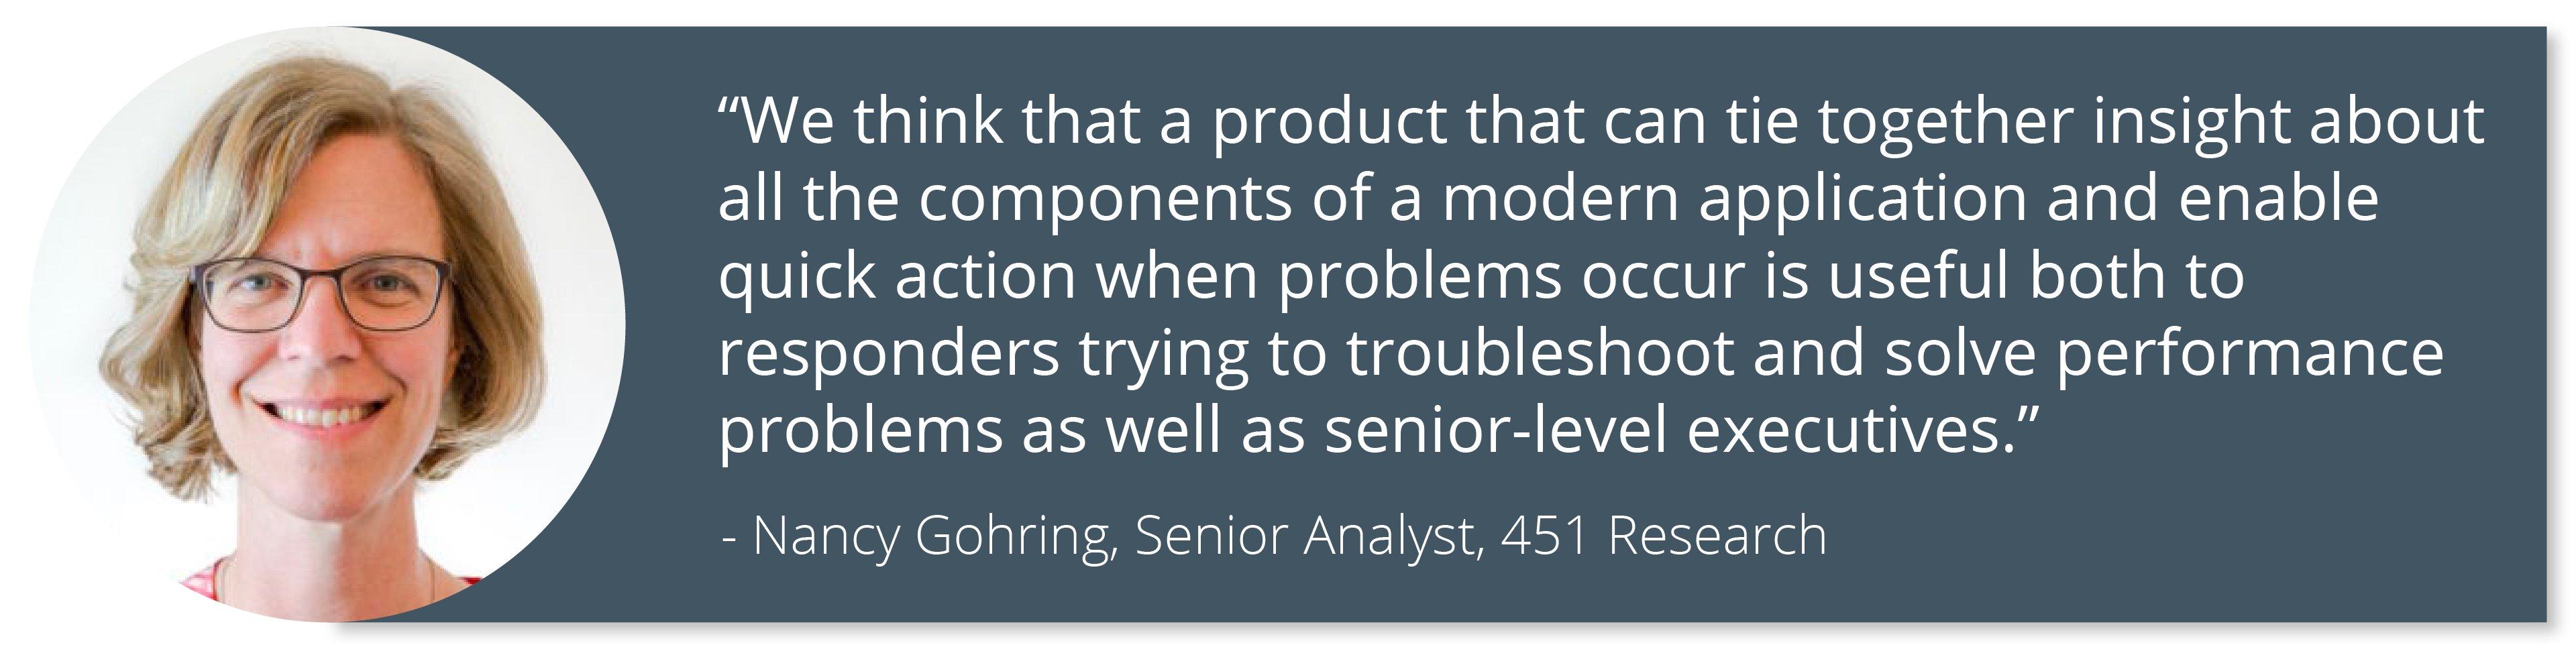 Nancy Gohring, Senior Analyst, 451 Research